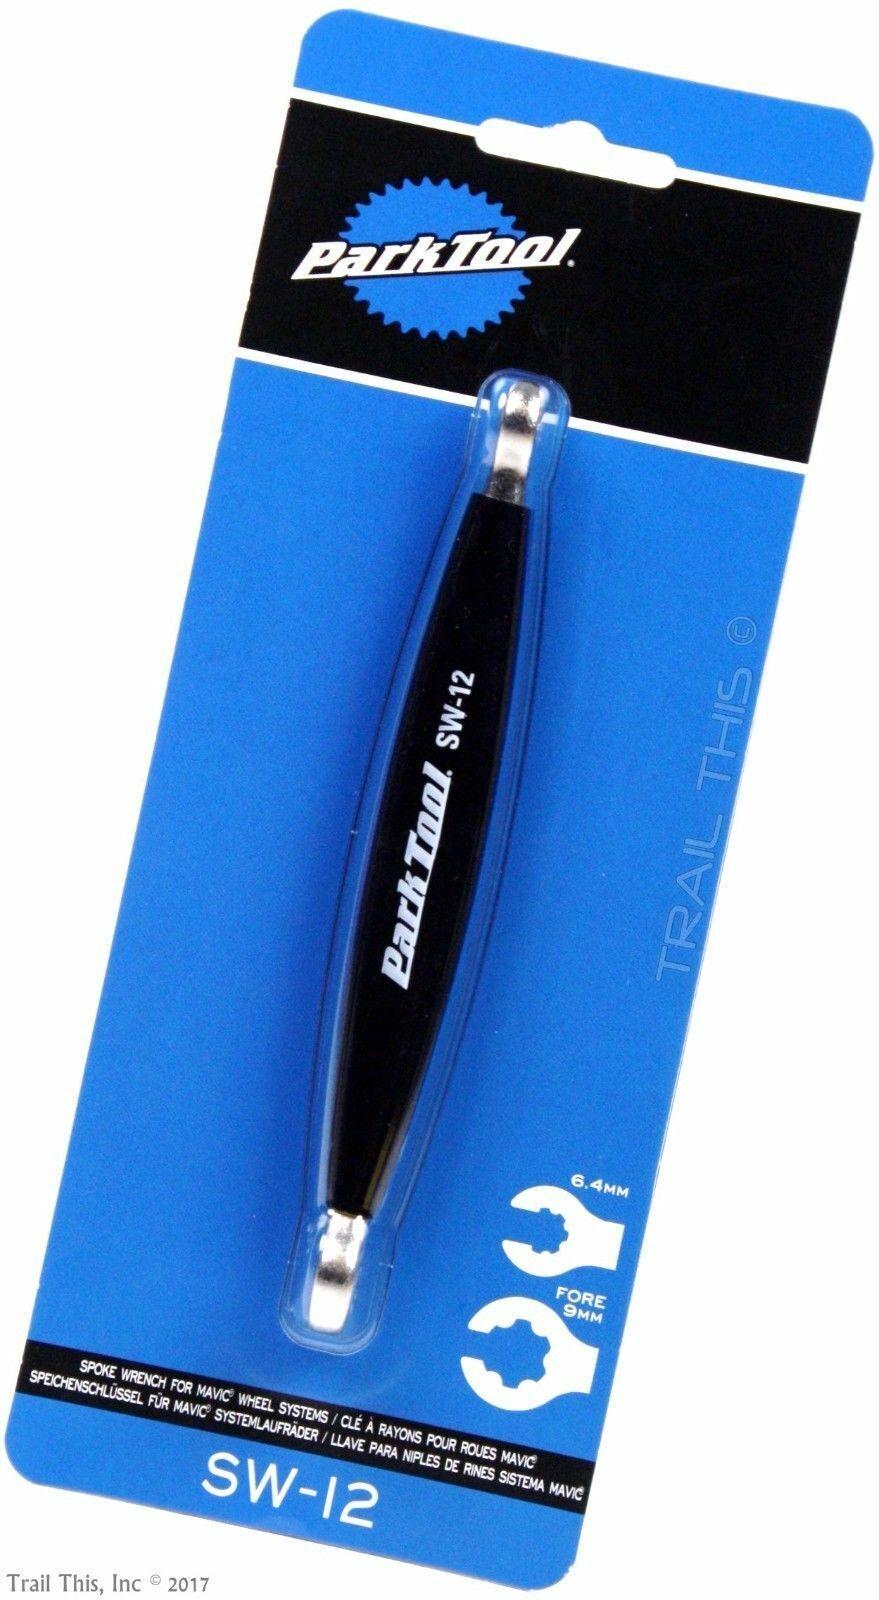 Park Tool SW-12C Spoke Wrench for 6/&7 Spline Mavic